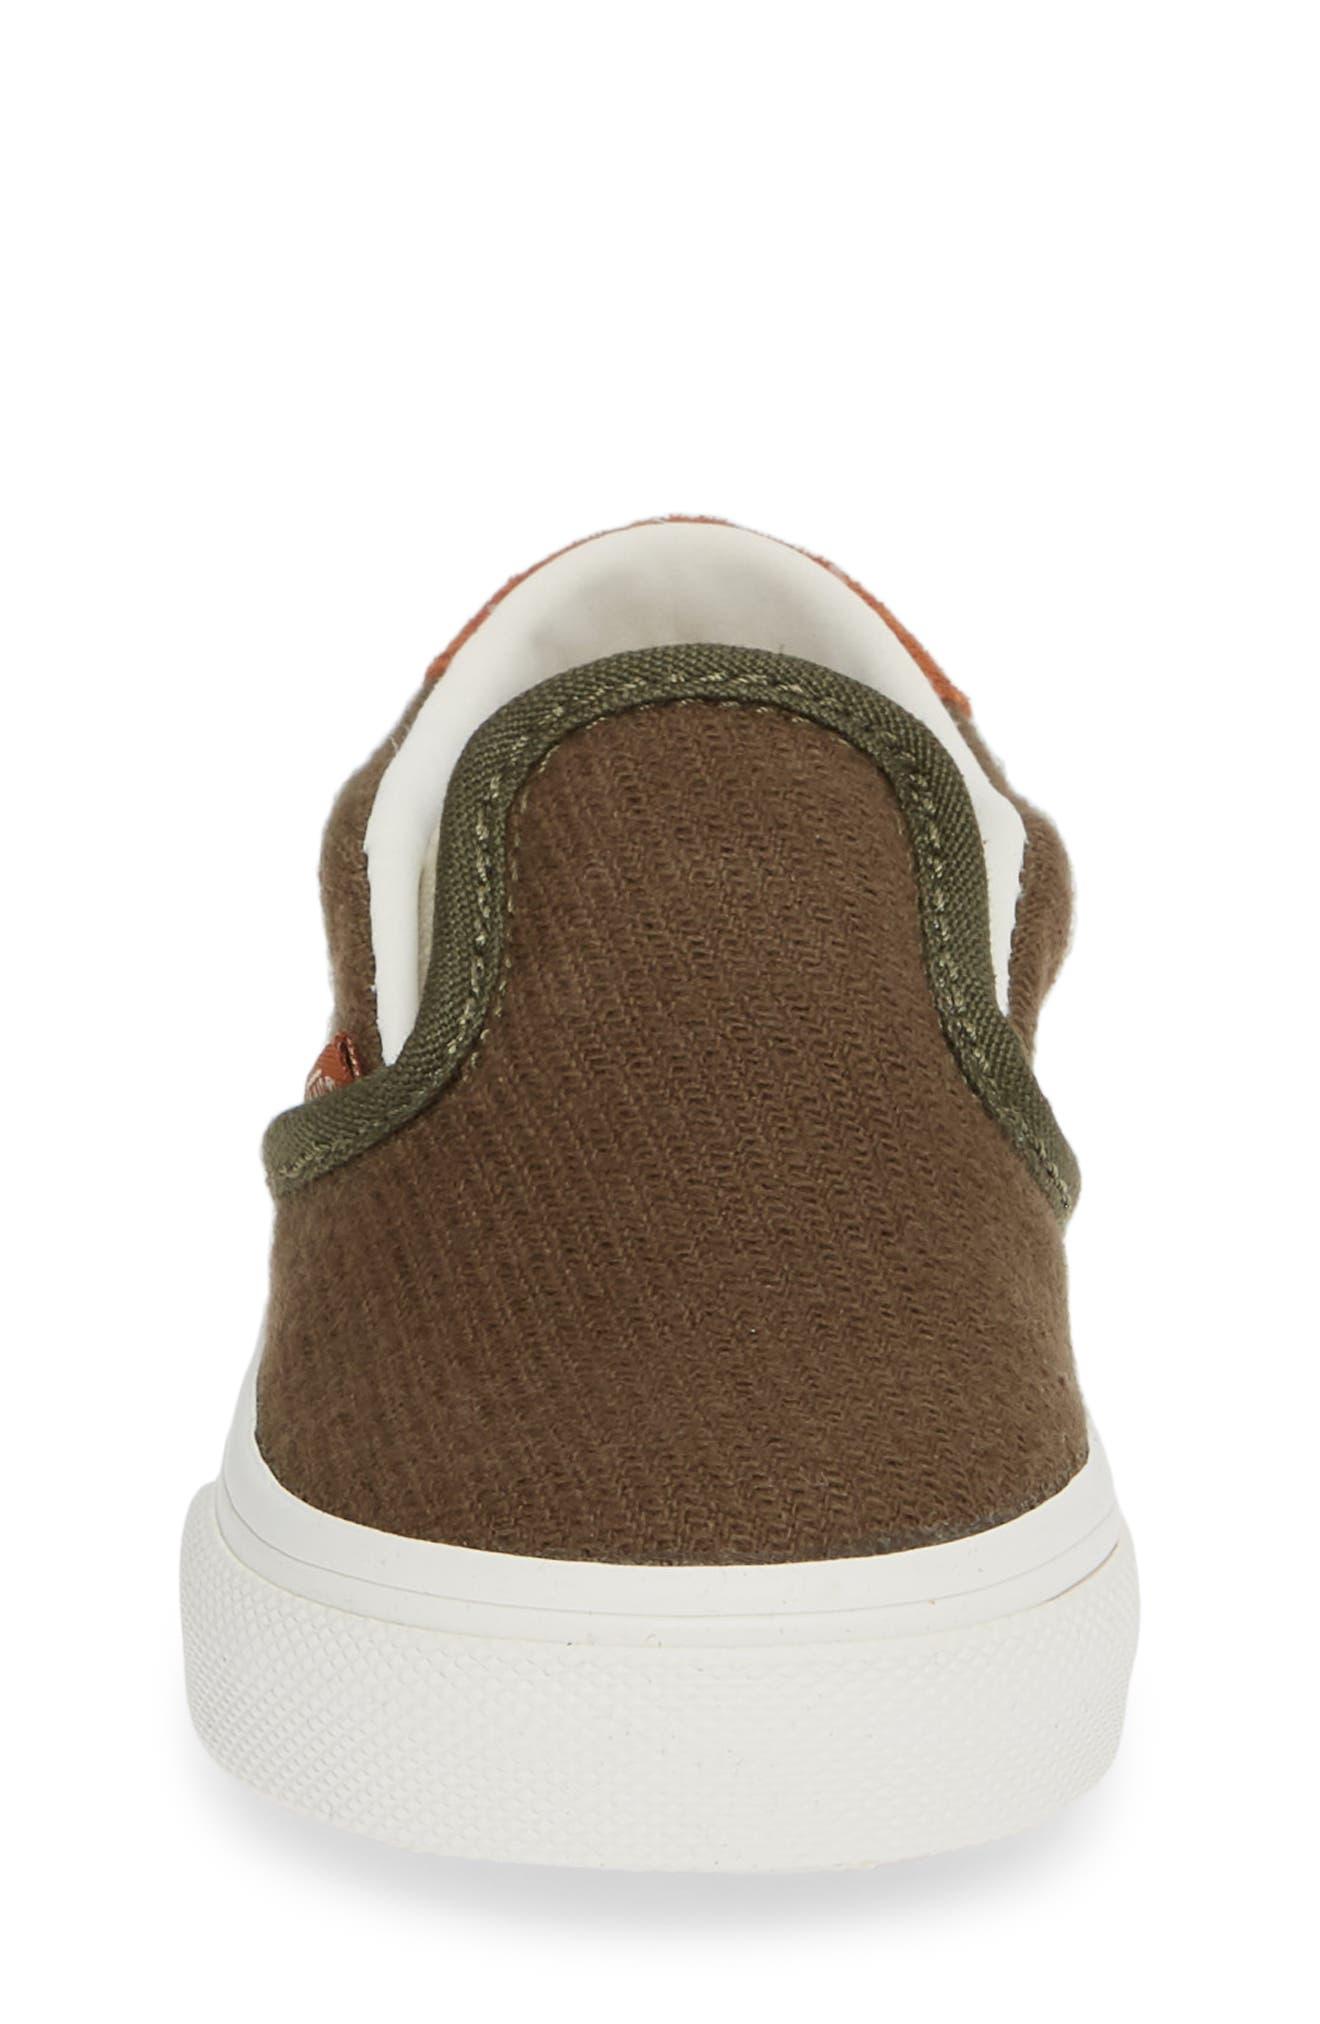 59 Slip-On Sneaker,                             Alternate thumbnail 4, color,                             FLANNEL DUSTY OLIVE